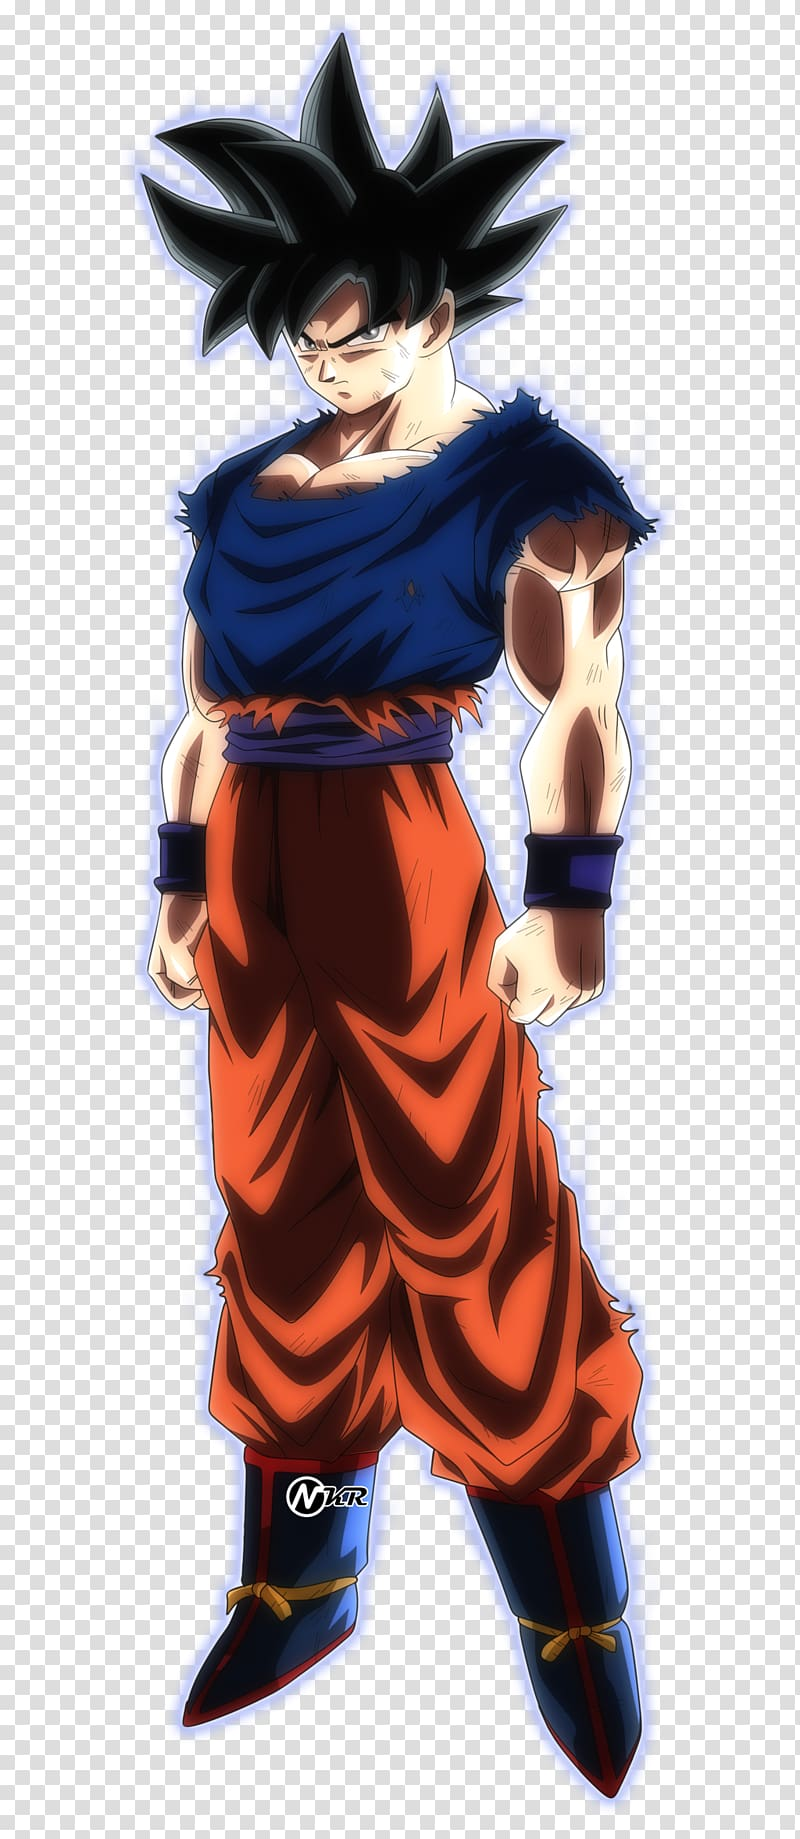 Goku Filho, Goku Troncos Vegeta Gohan Piccolo, goku png